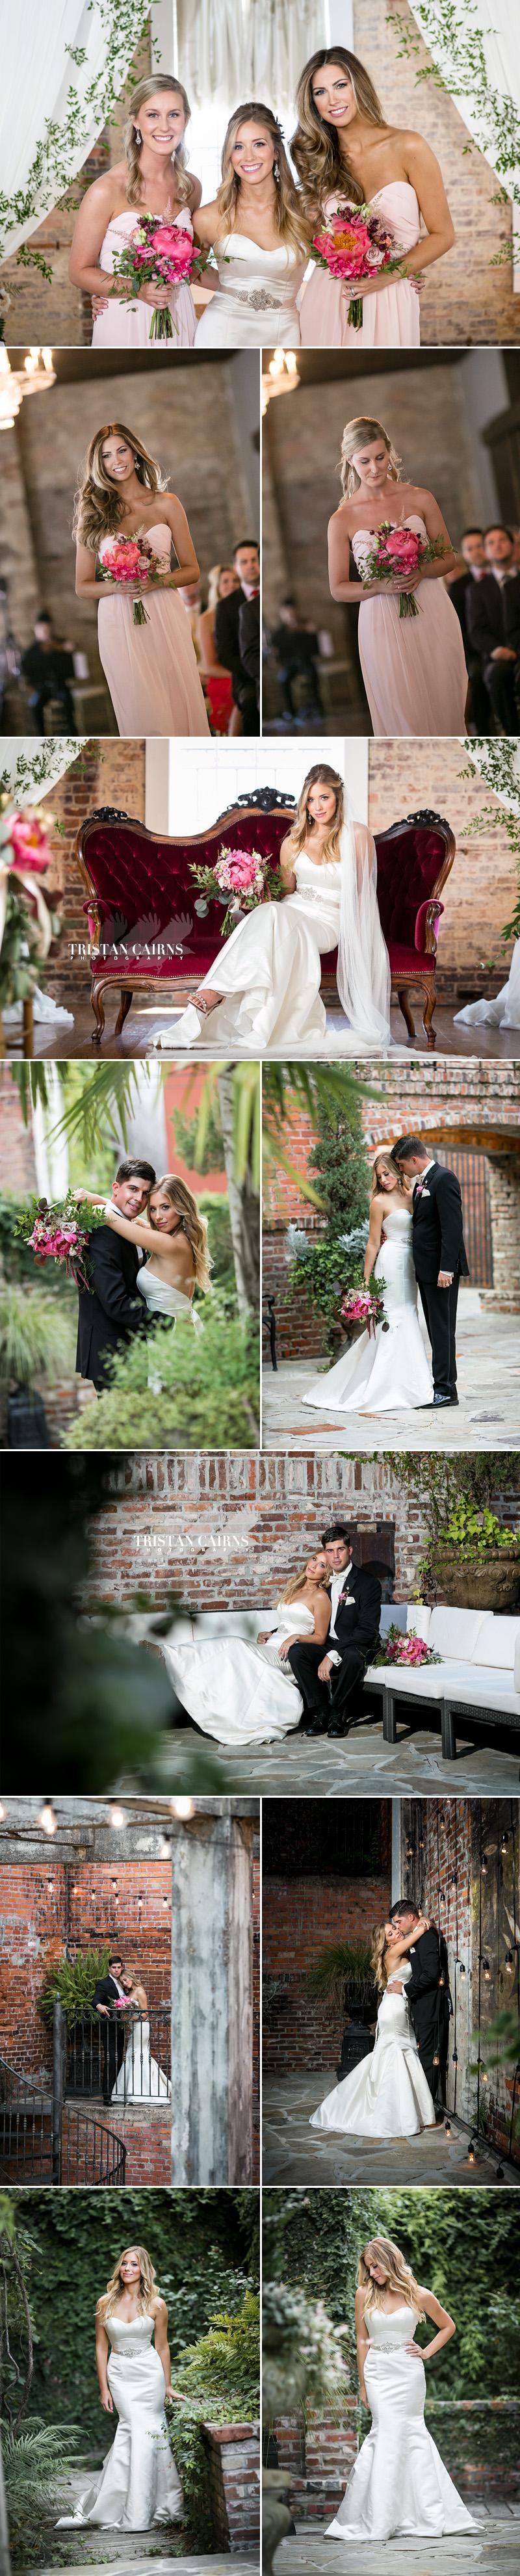 Wedding Photography Dothan Al: Wedding Photography